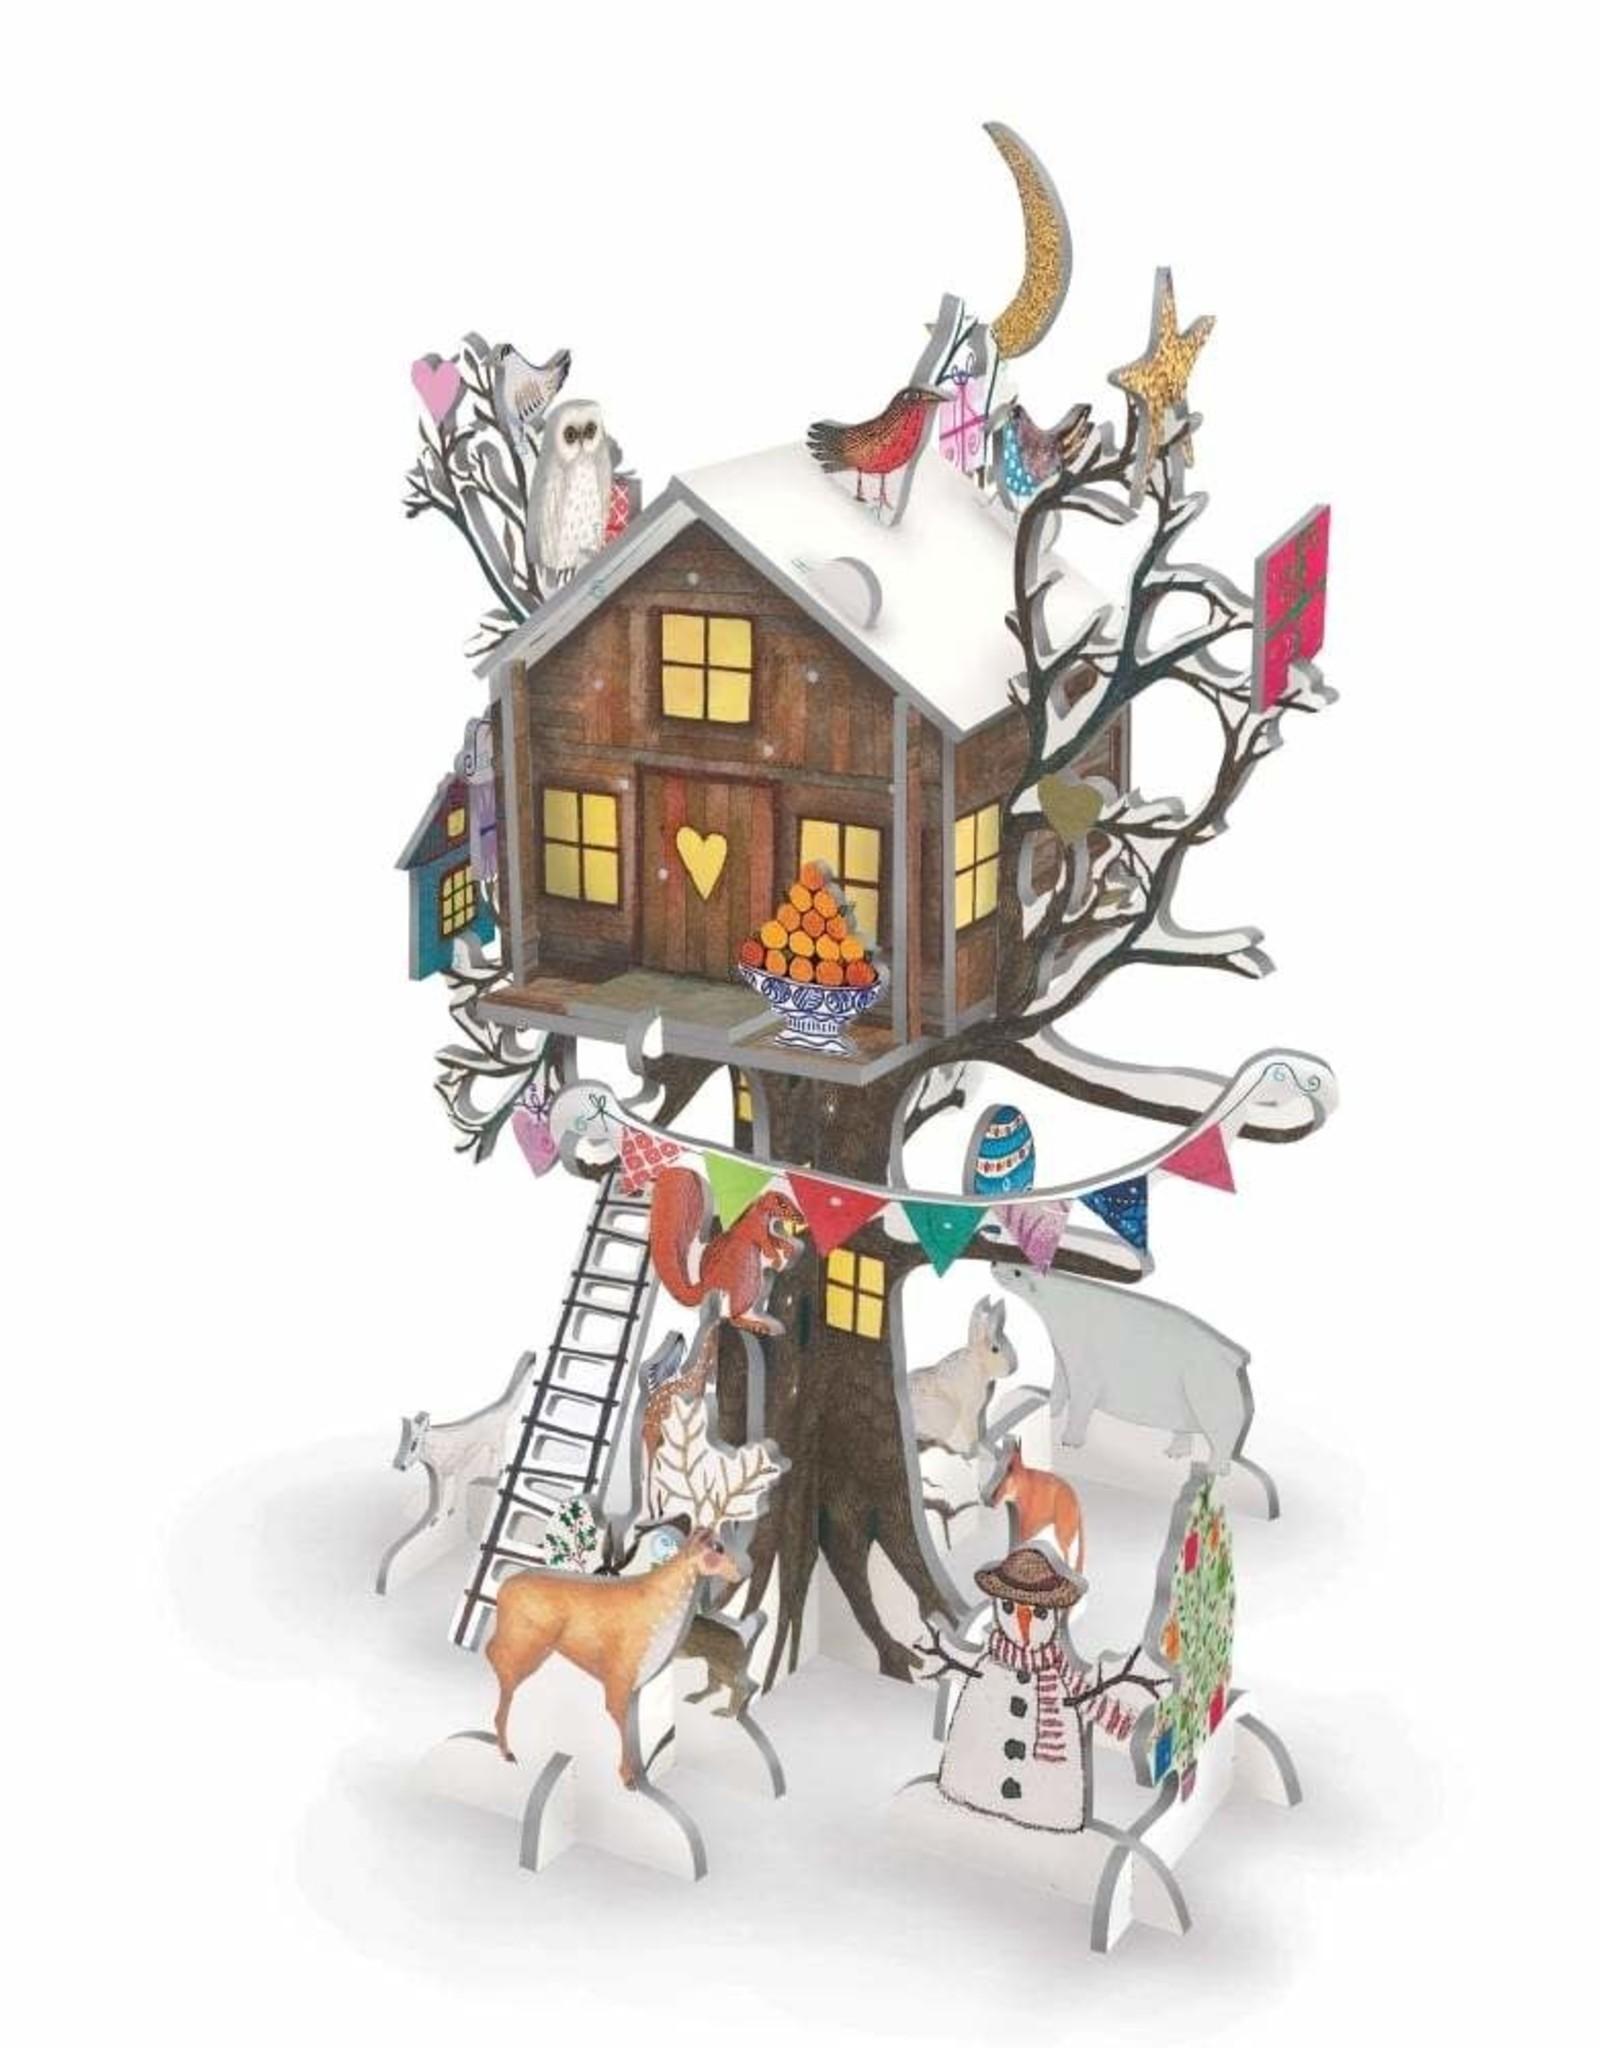 Pop & Slot Adventkalender Christmas Treehouse